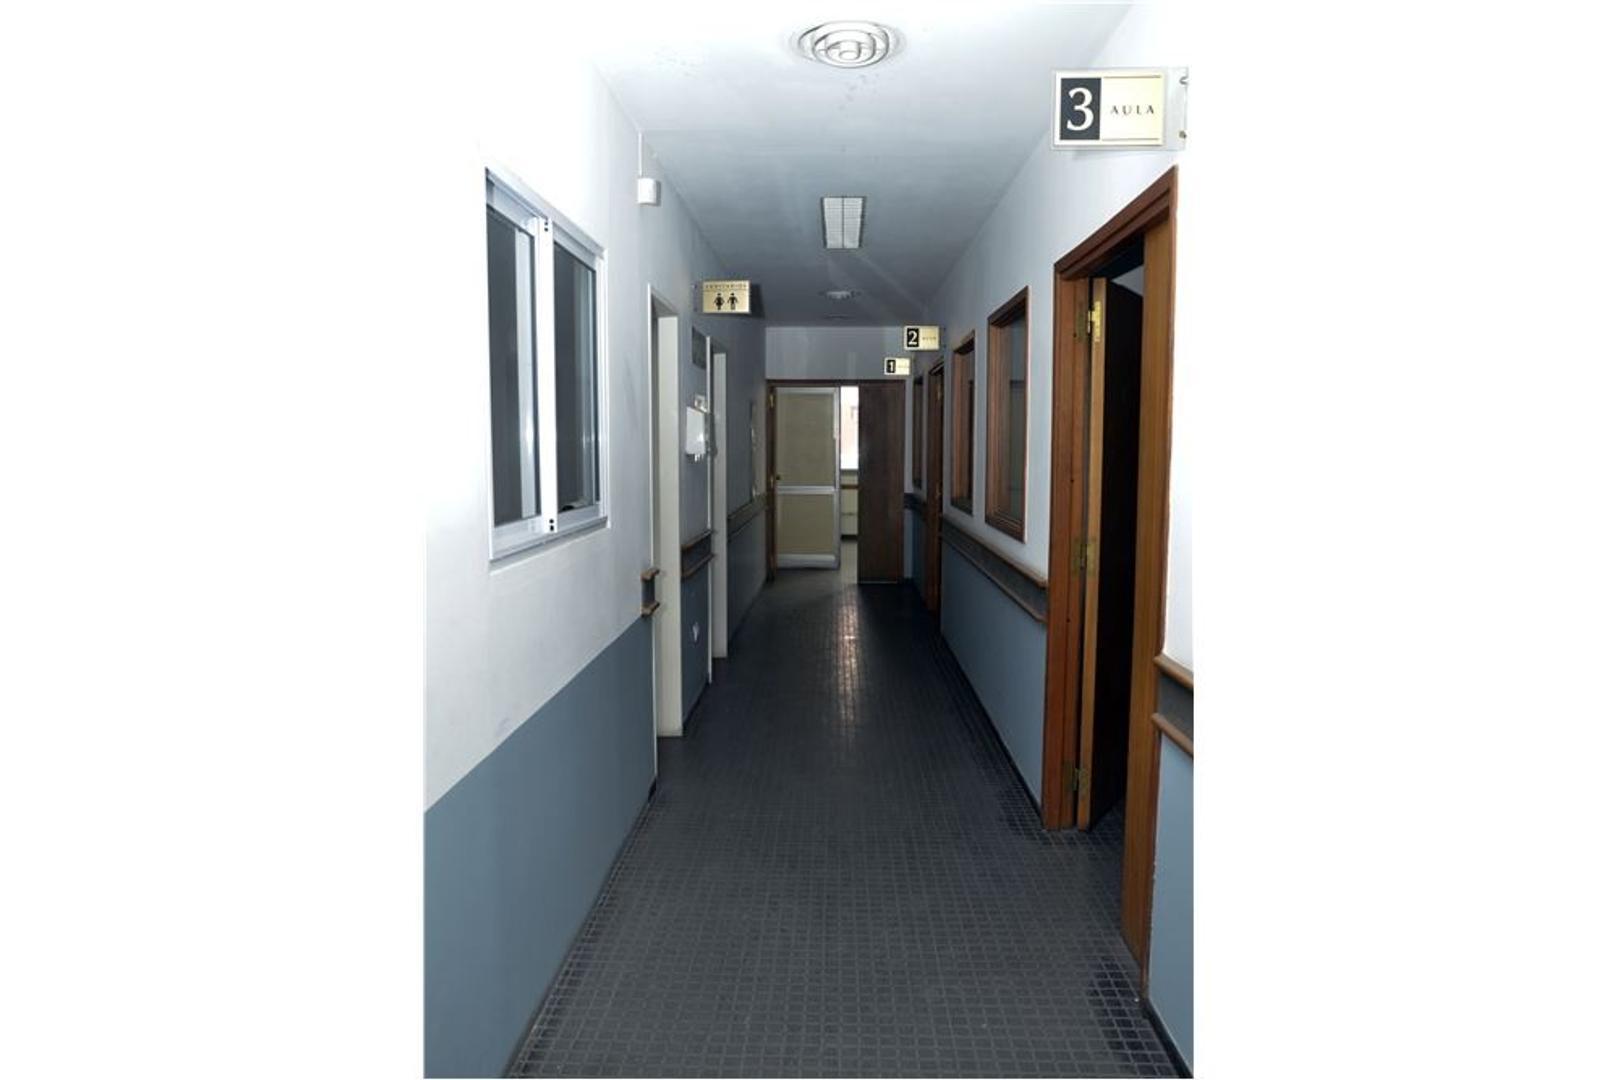 Departamento Oficina Instituto En San Telmo